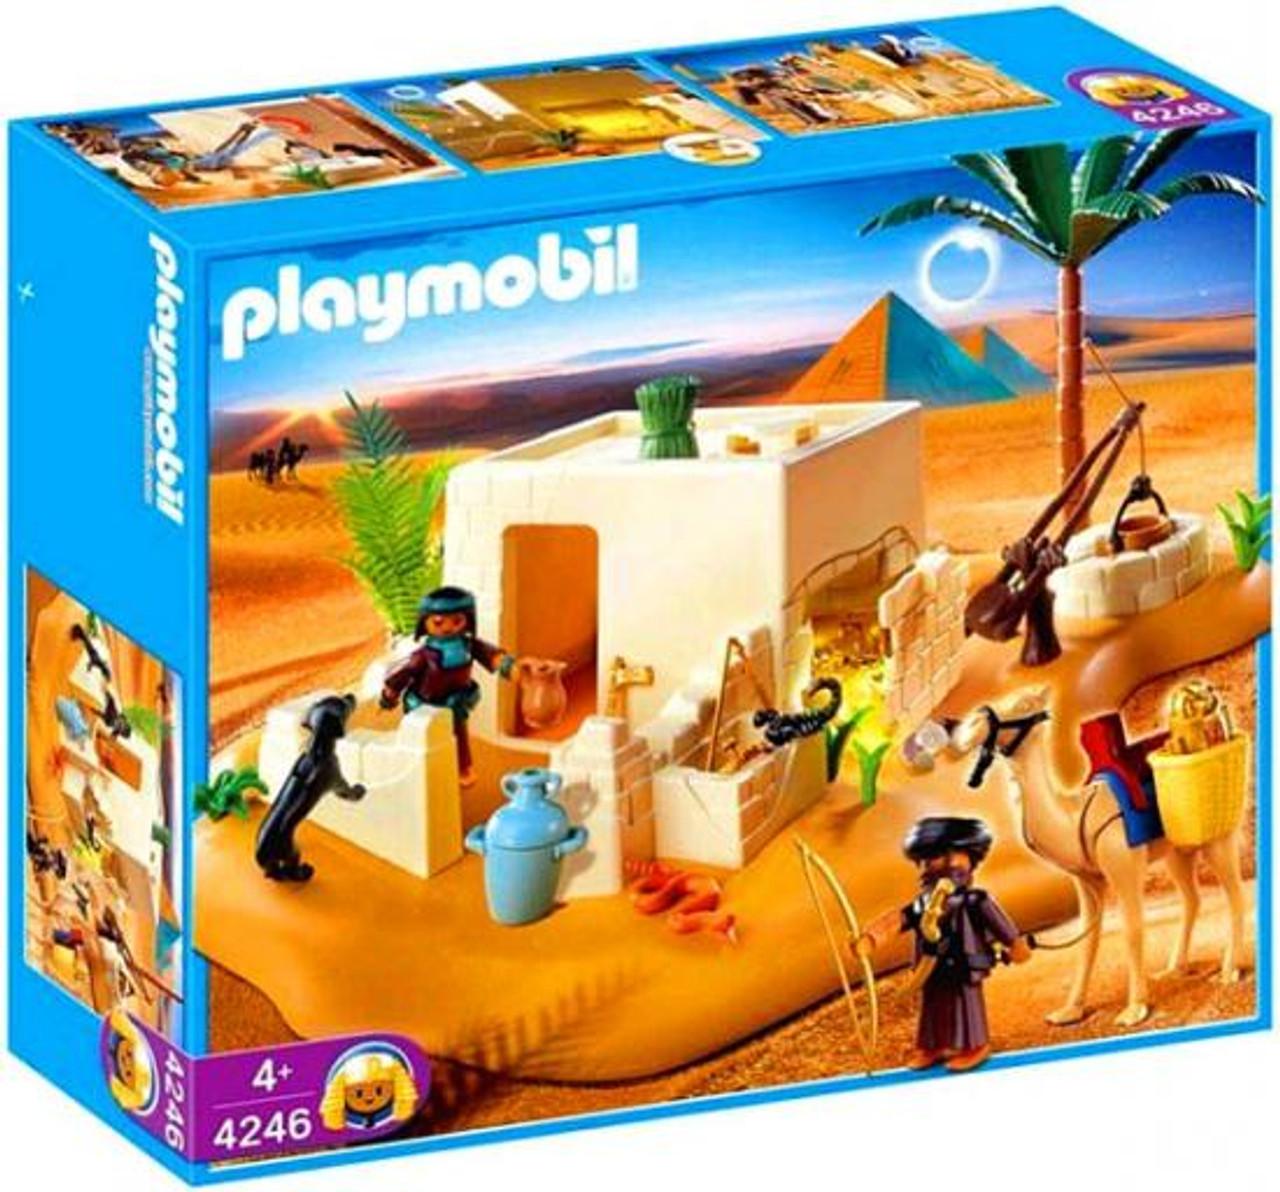 Playmobil Romans & Egyptians Tomb with Treasure Set #4246